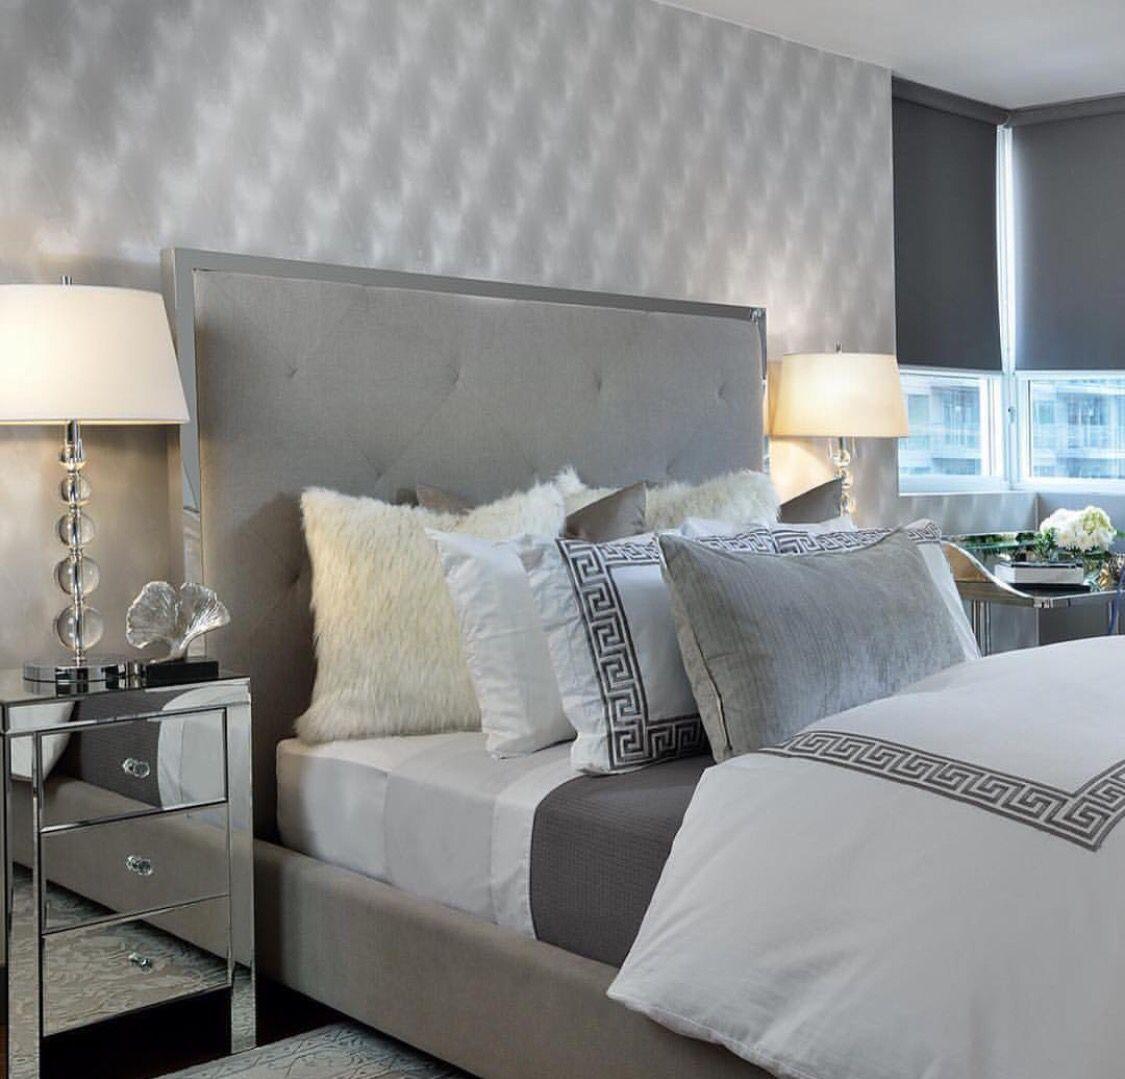 Master bedroom wall decor diy  Pin by JanayChantel  Beauty Diy Lifestyle Fashion on